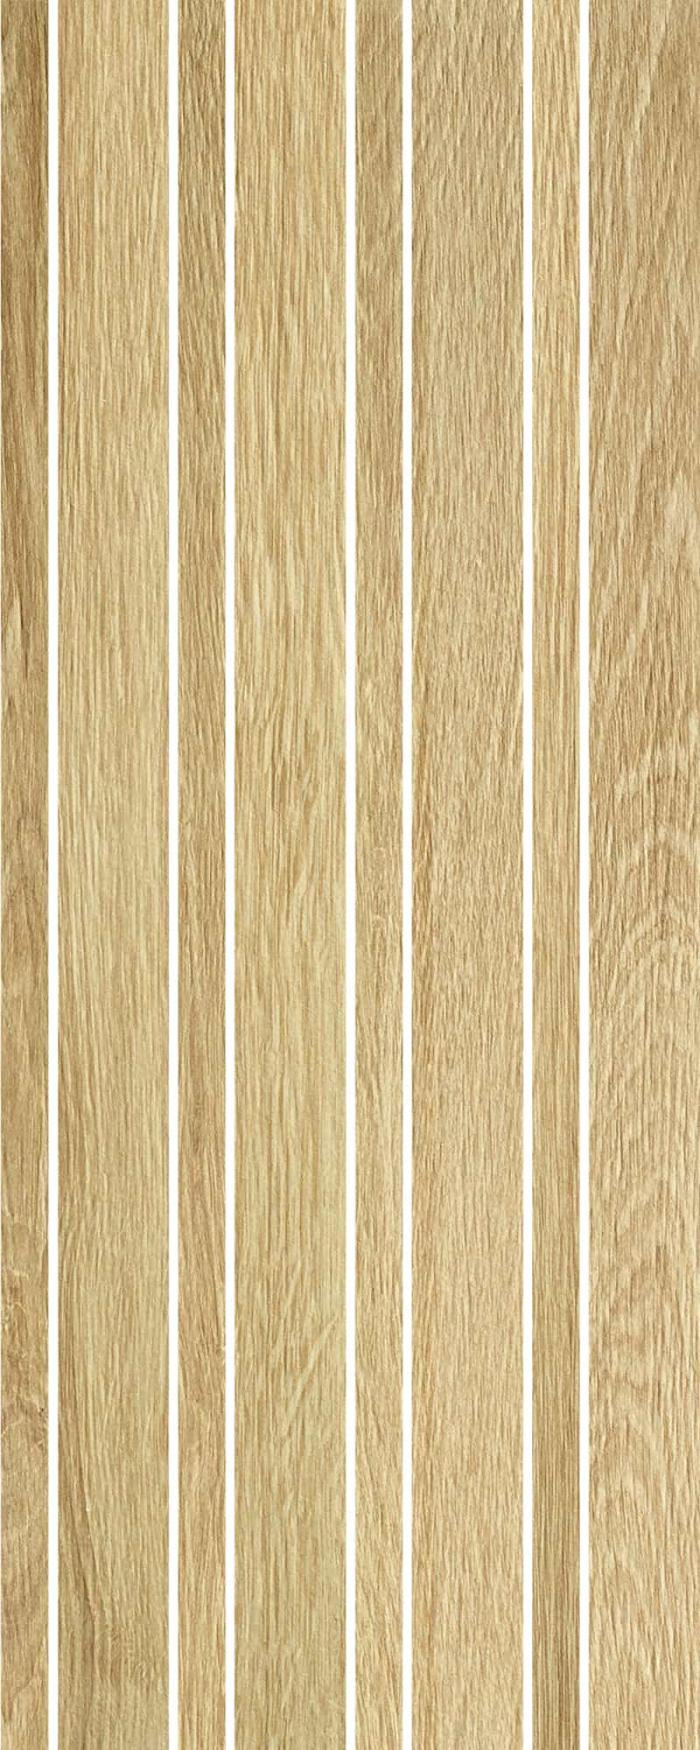 Mosaic Timber Raw Light Beige AS